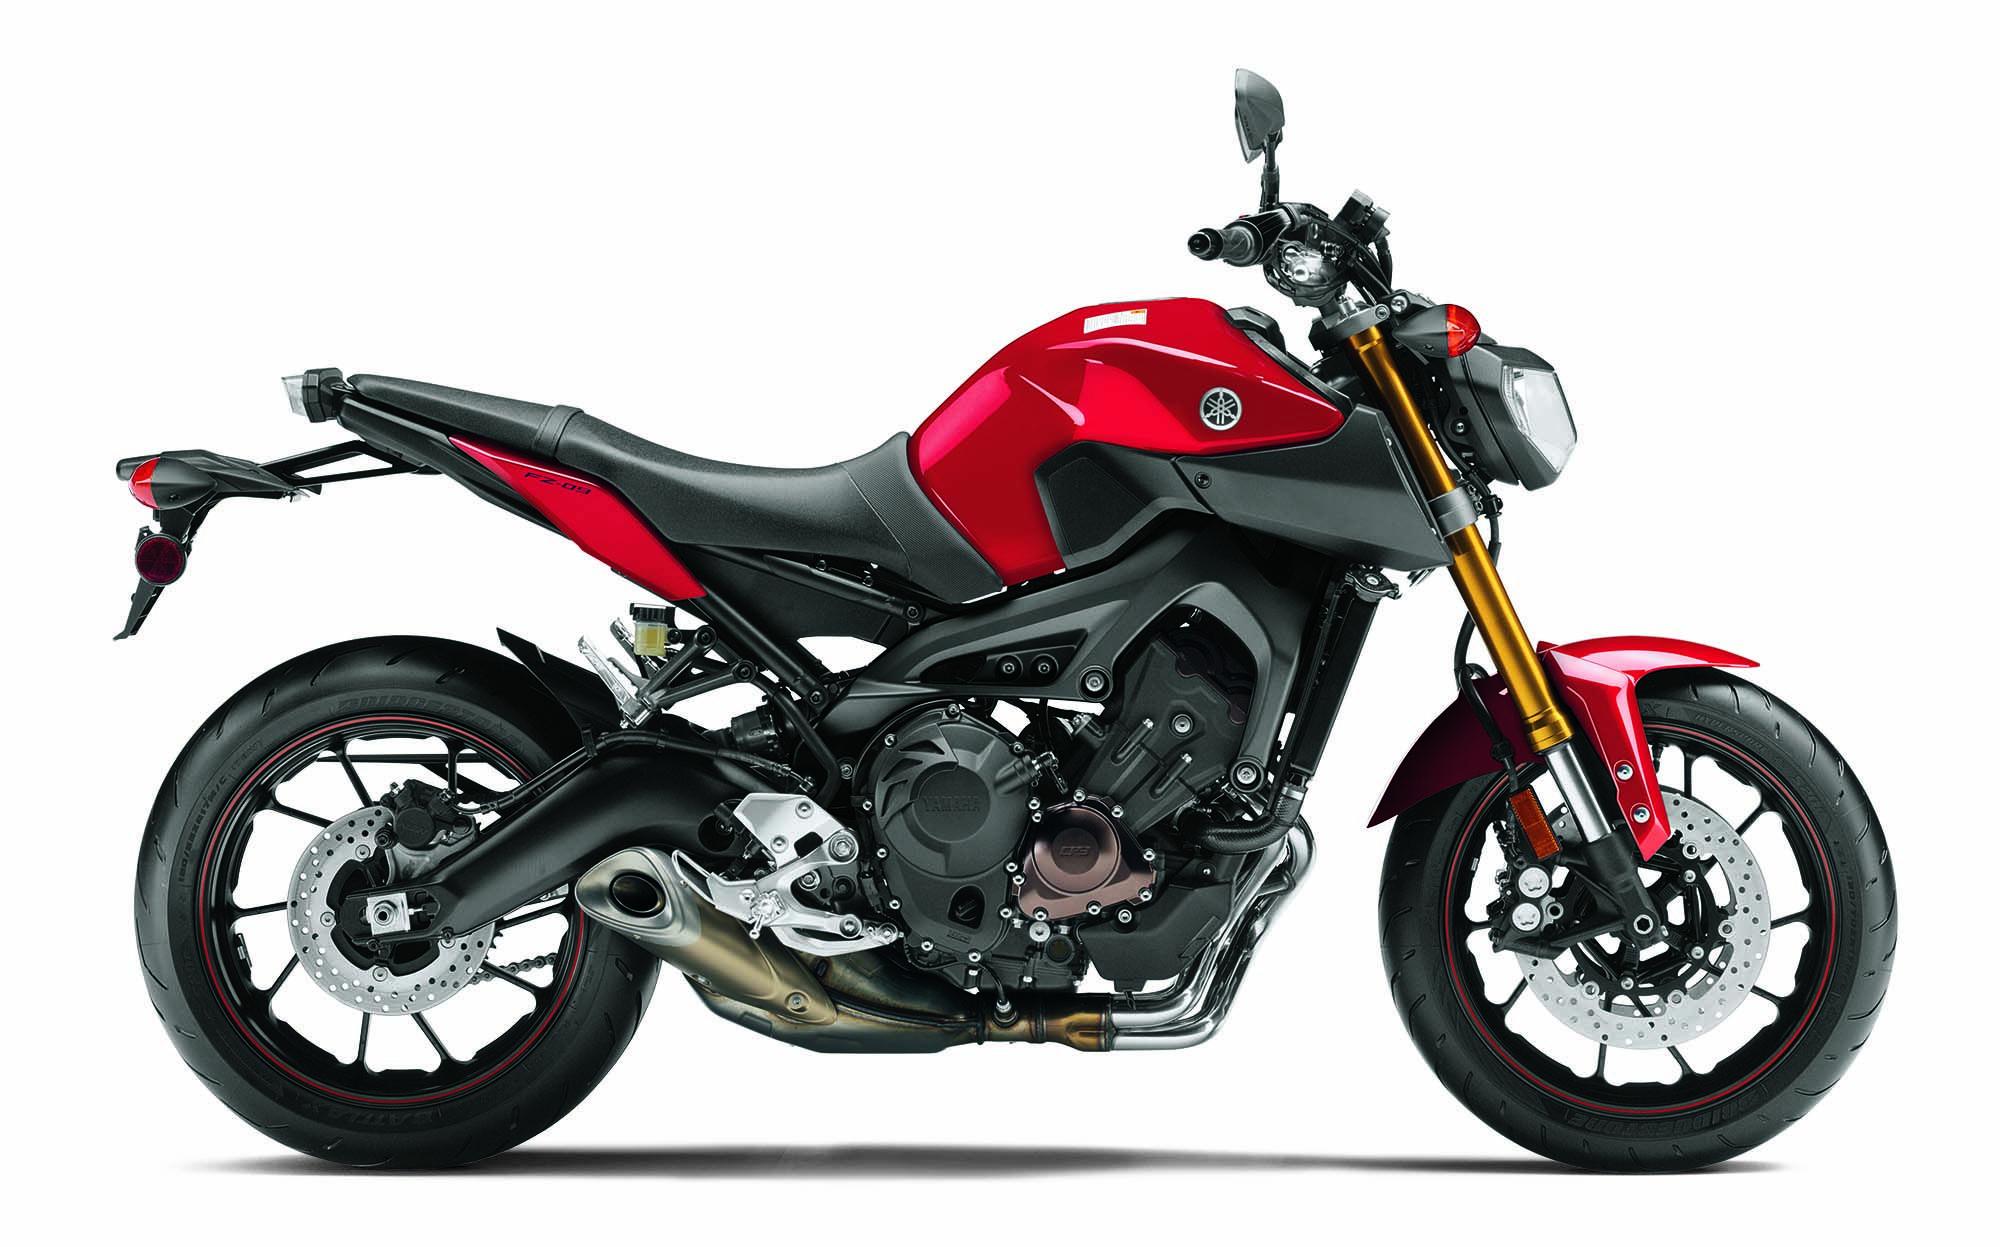 Moto yamaha scrambler cars motorcycles bobber forward mt09 yamaha - 2014 Yamaha Fz 09 Three Cylinders Of Naked